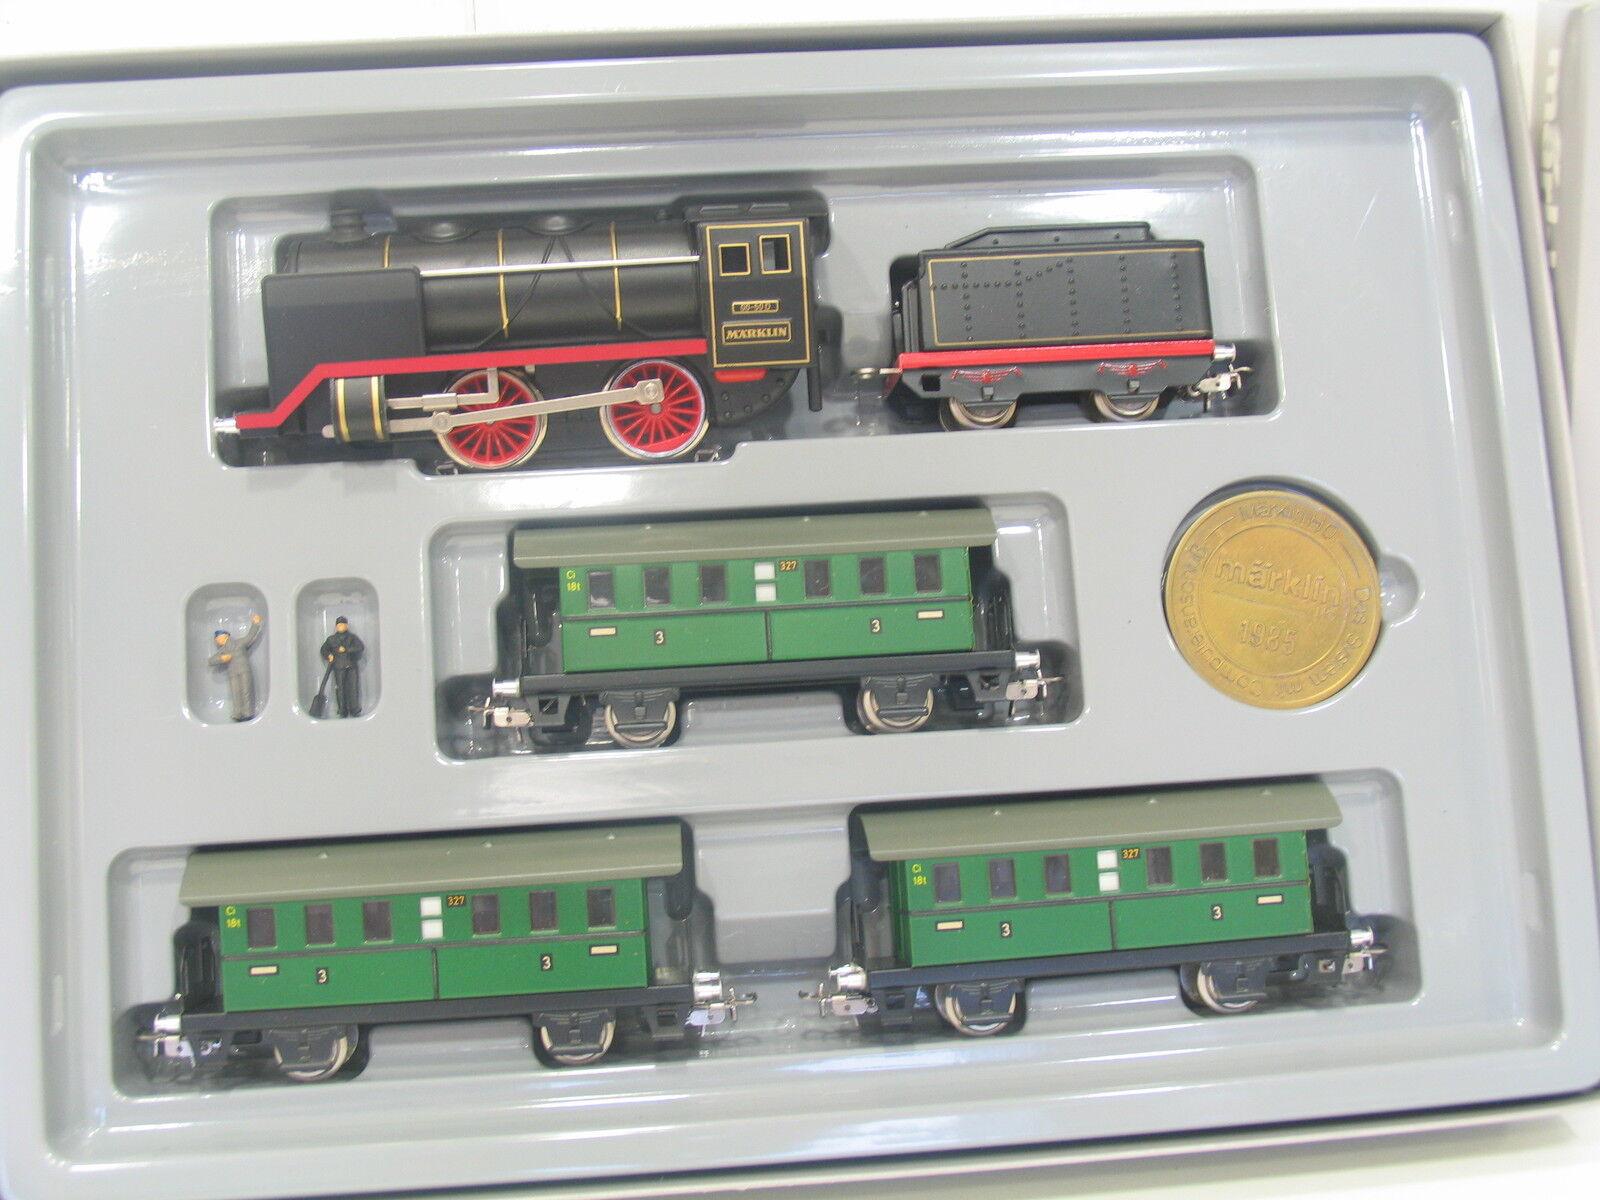 Märklin 0050 tren-set nostalgia de pasajeros rce con máquina de vapor (v2012)